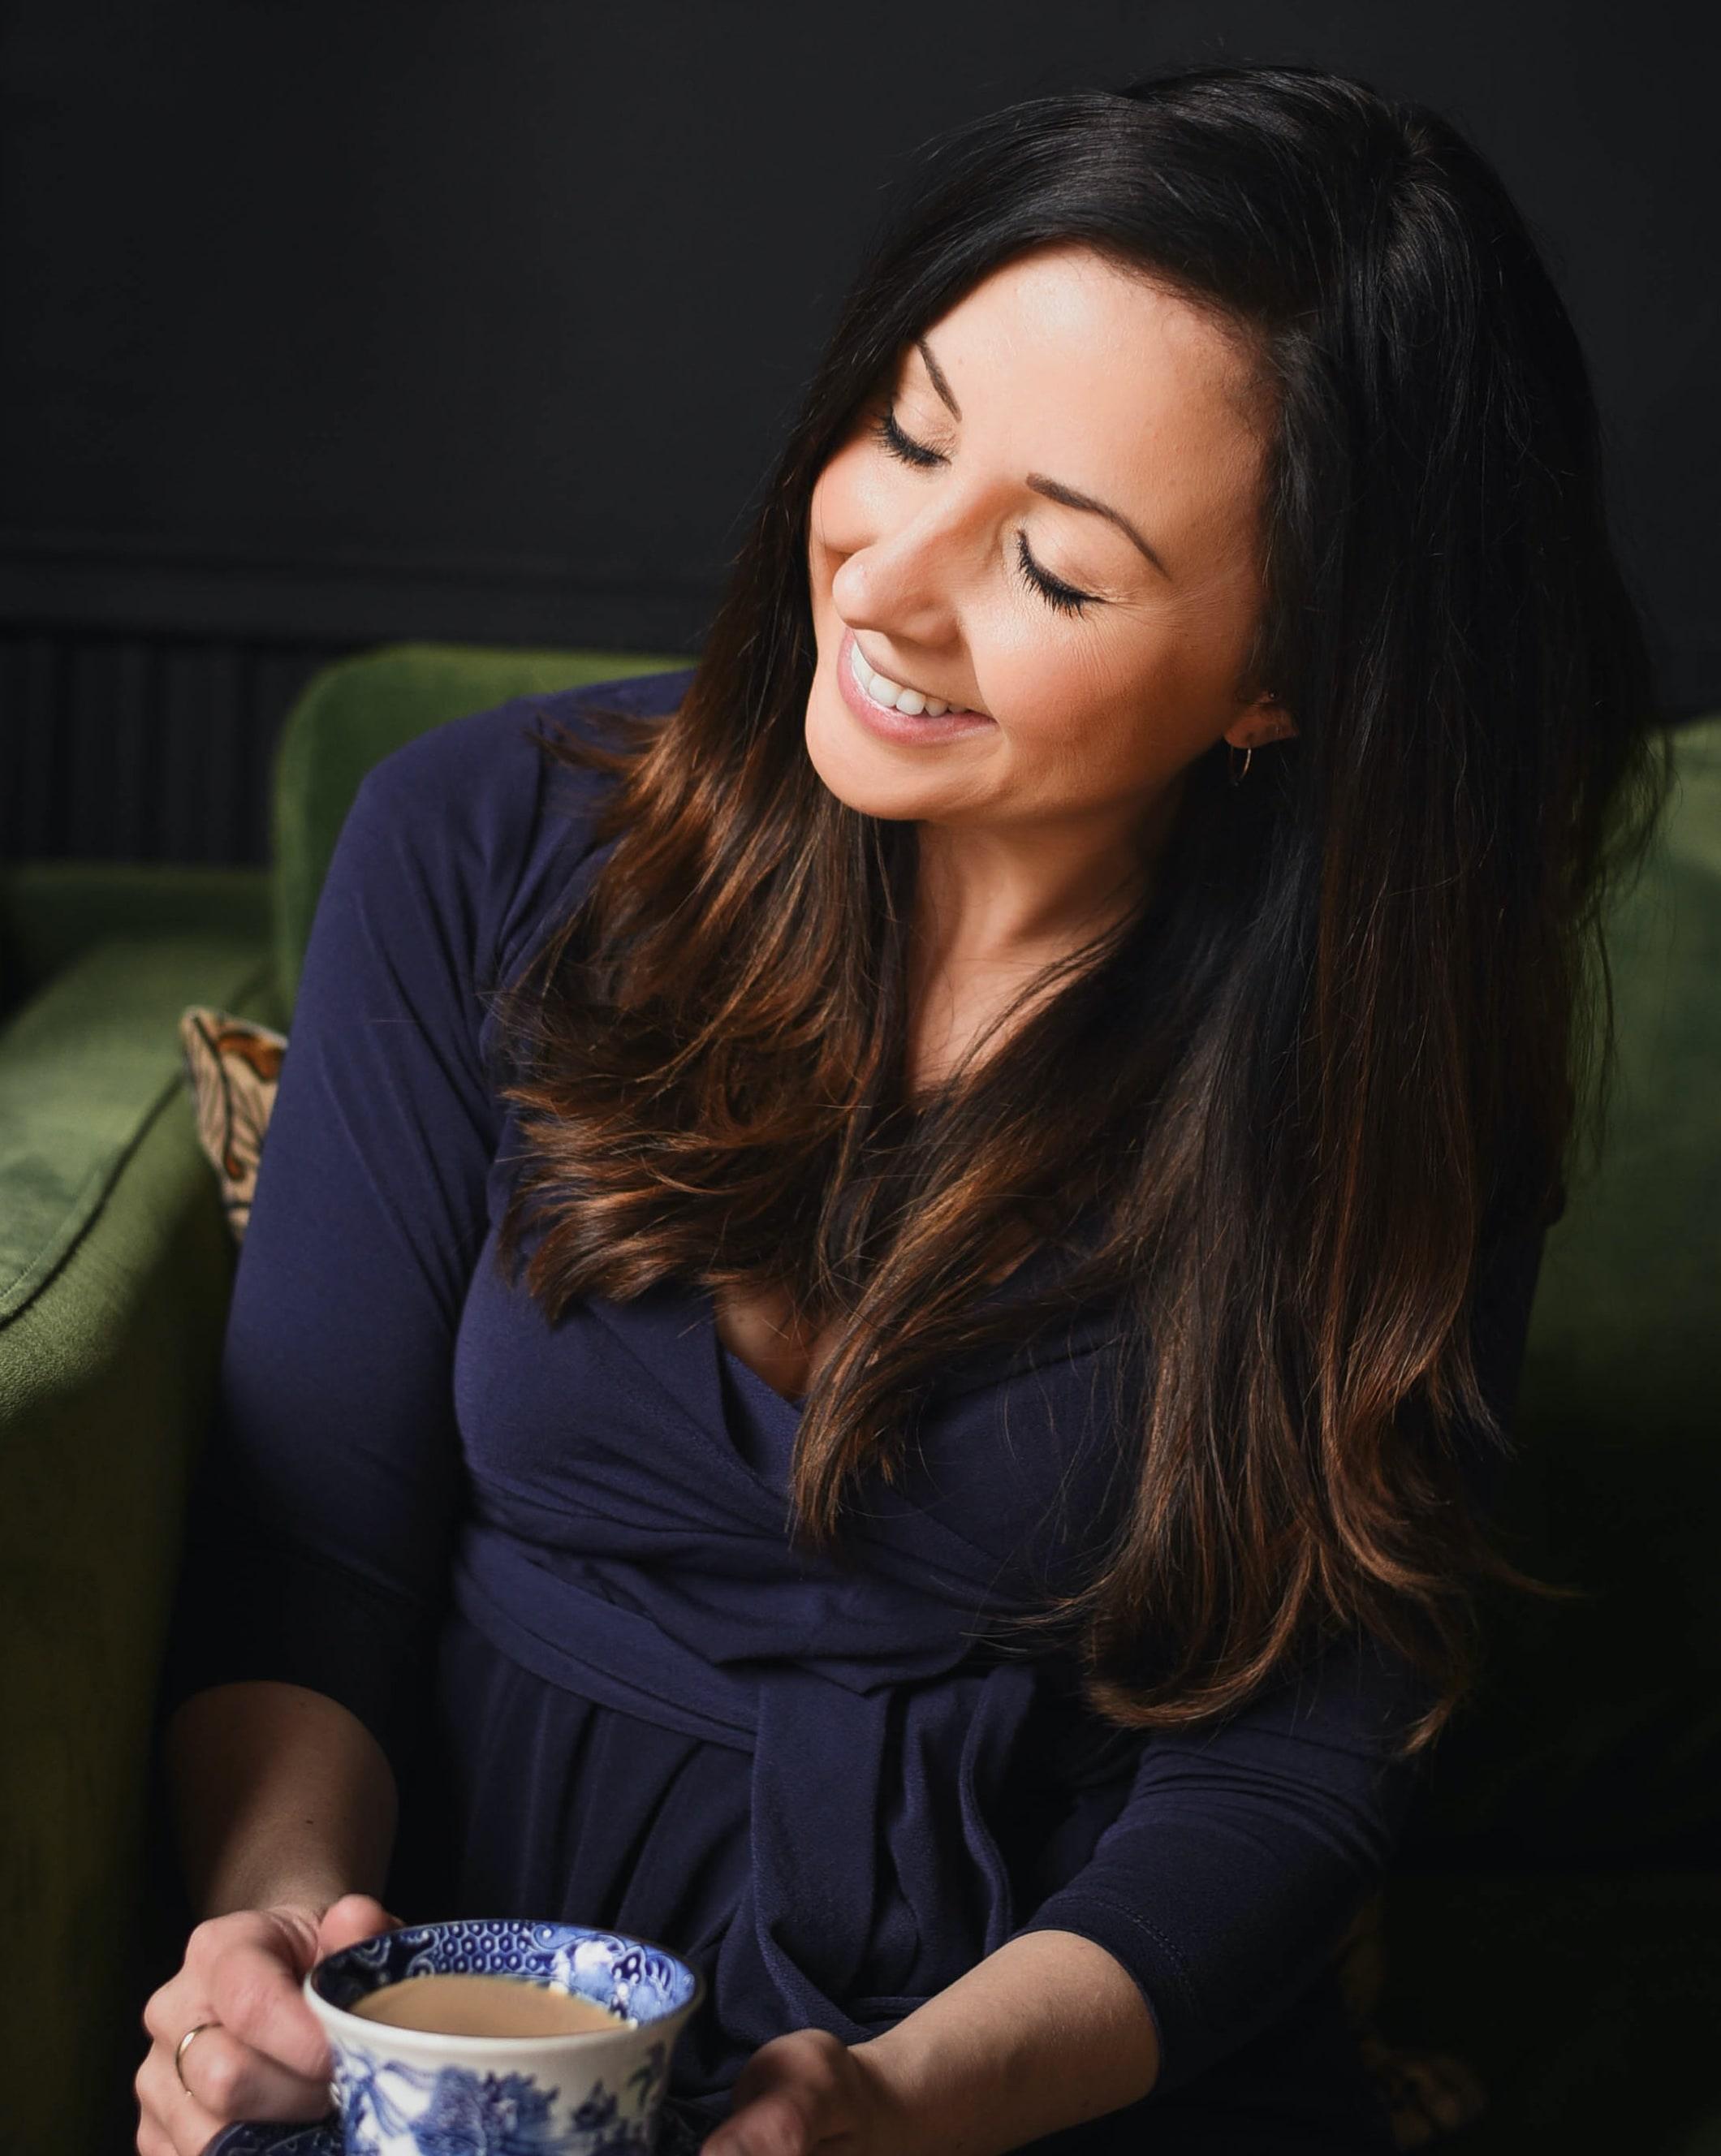 Lauren O'Sullivan, host of the Beyond the Stories podcast